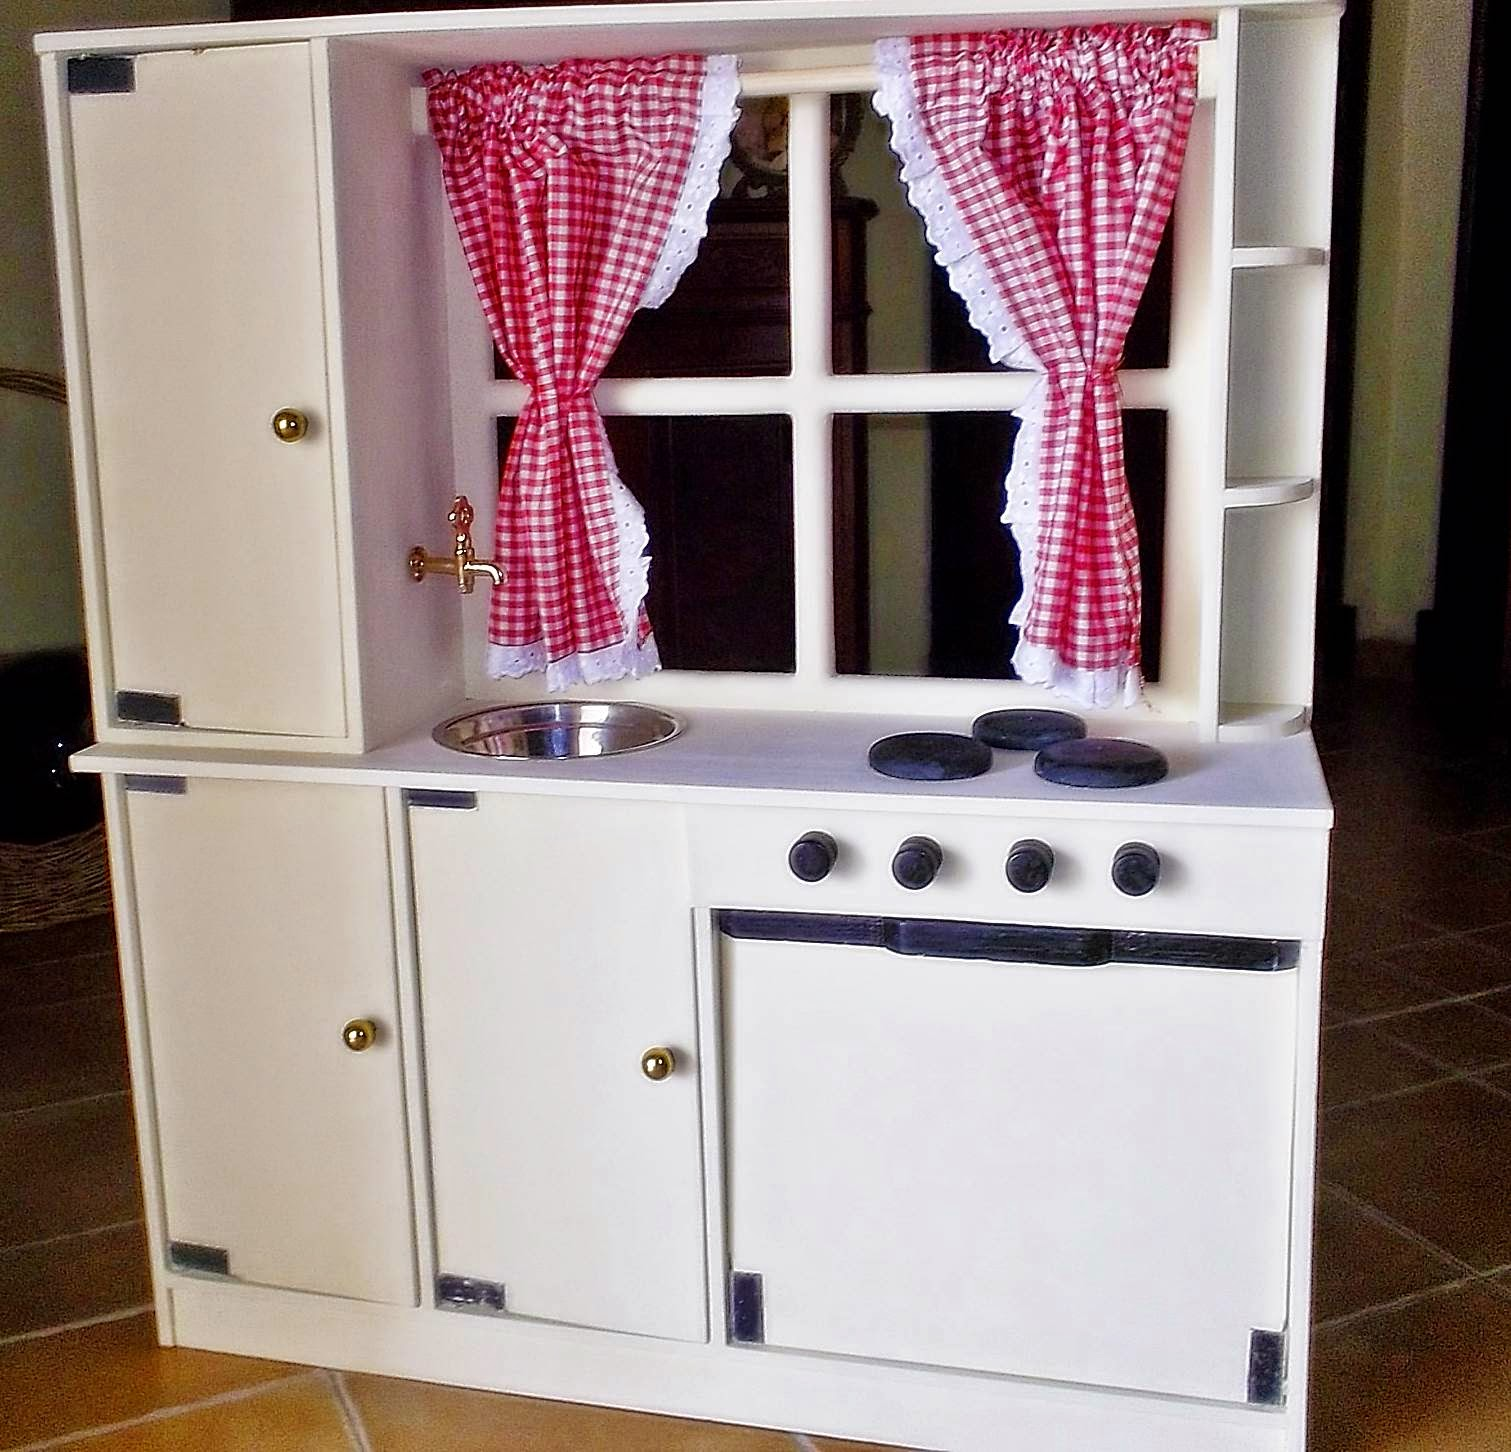 Madera artesana productos elaborados artesanalmente - Cocina infantil madera ...